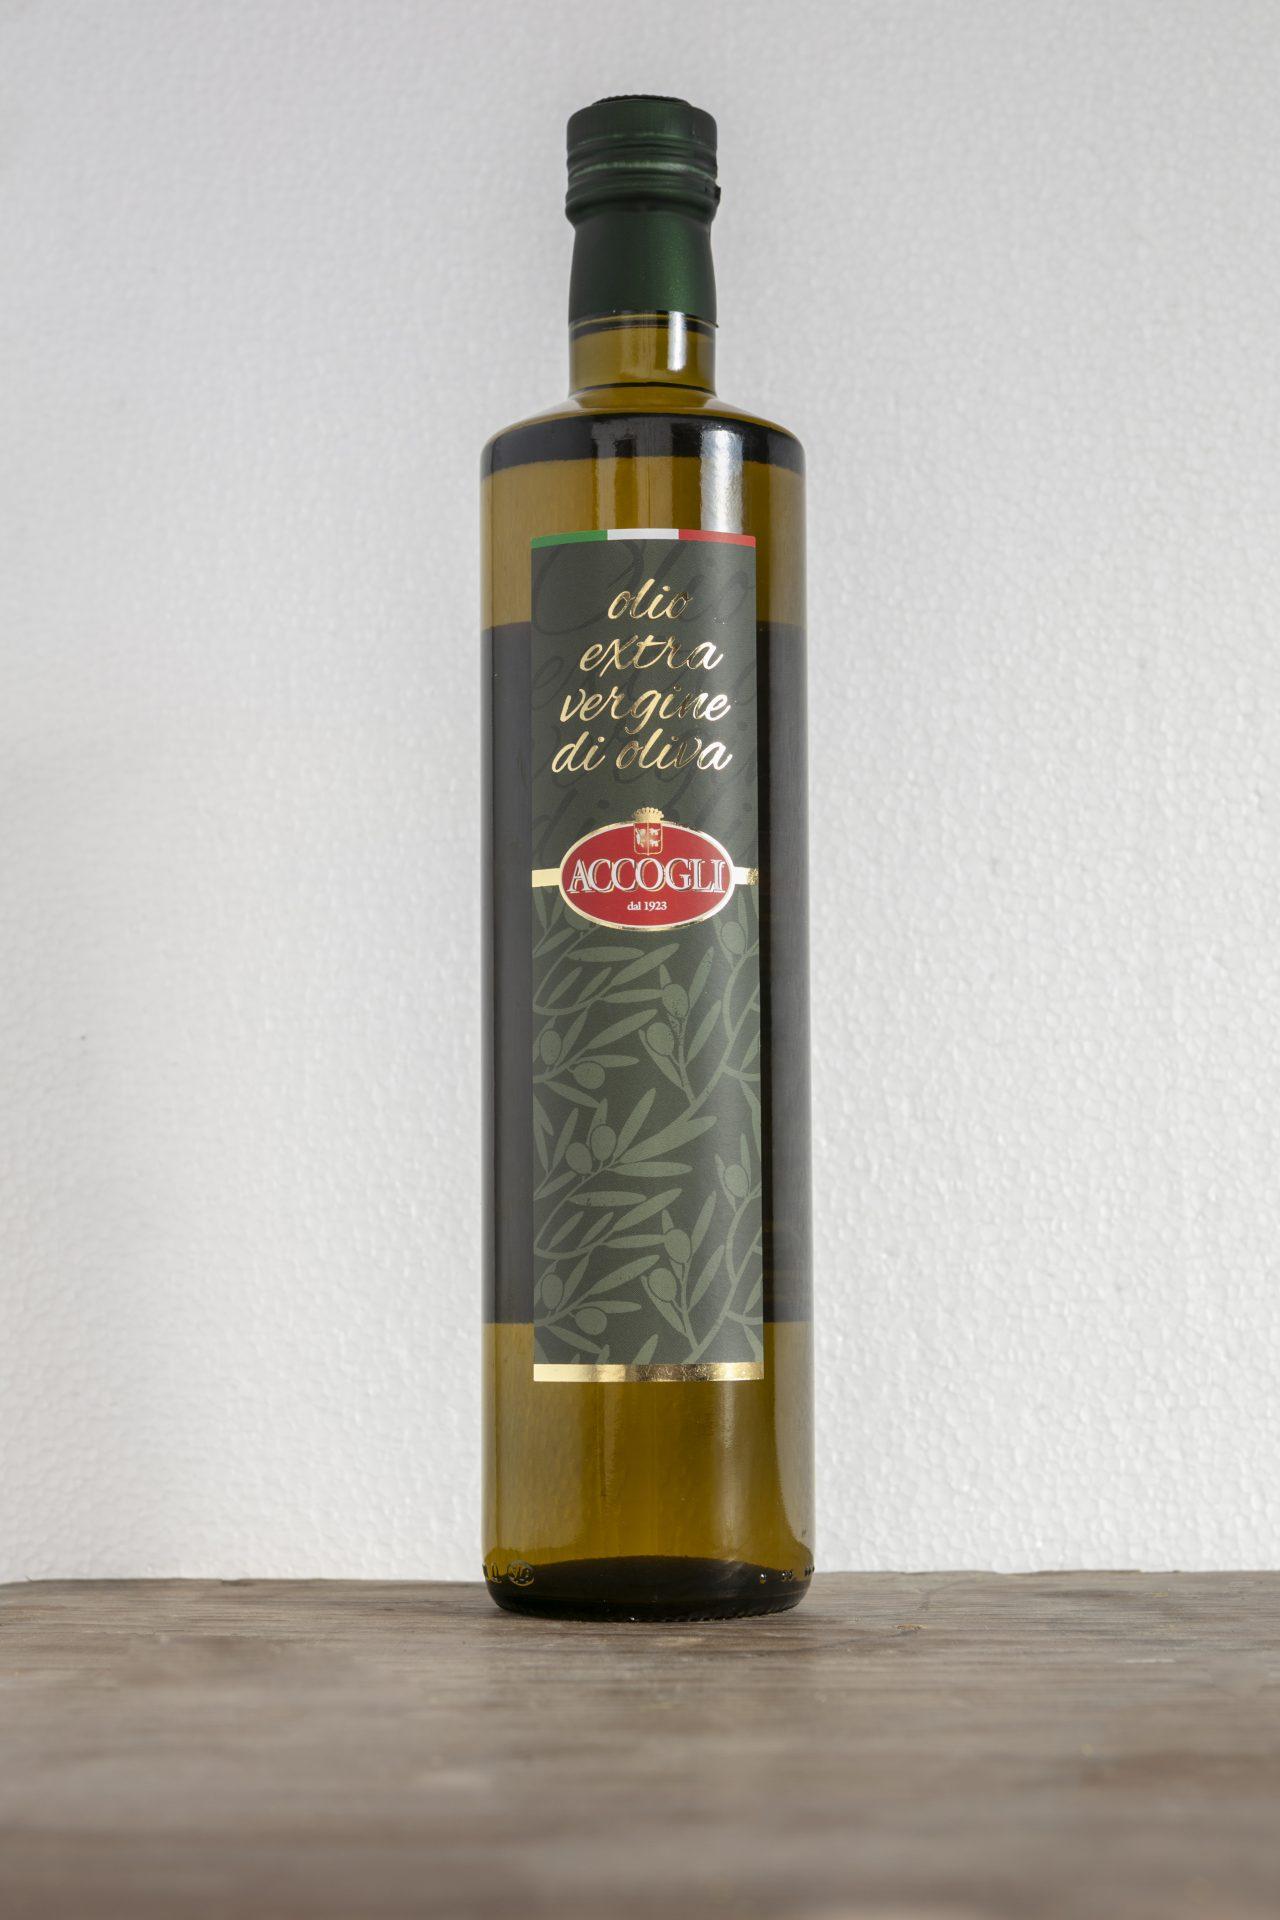 Produzione olio extravergine d'oliva - Oleificio Accordi SRL – Lecce